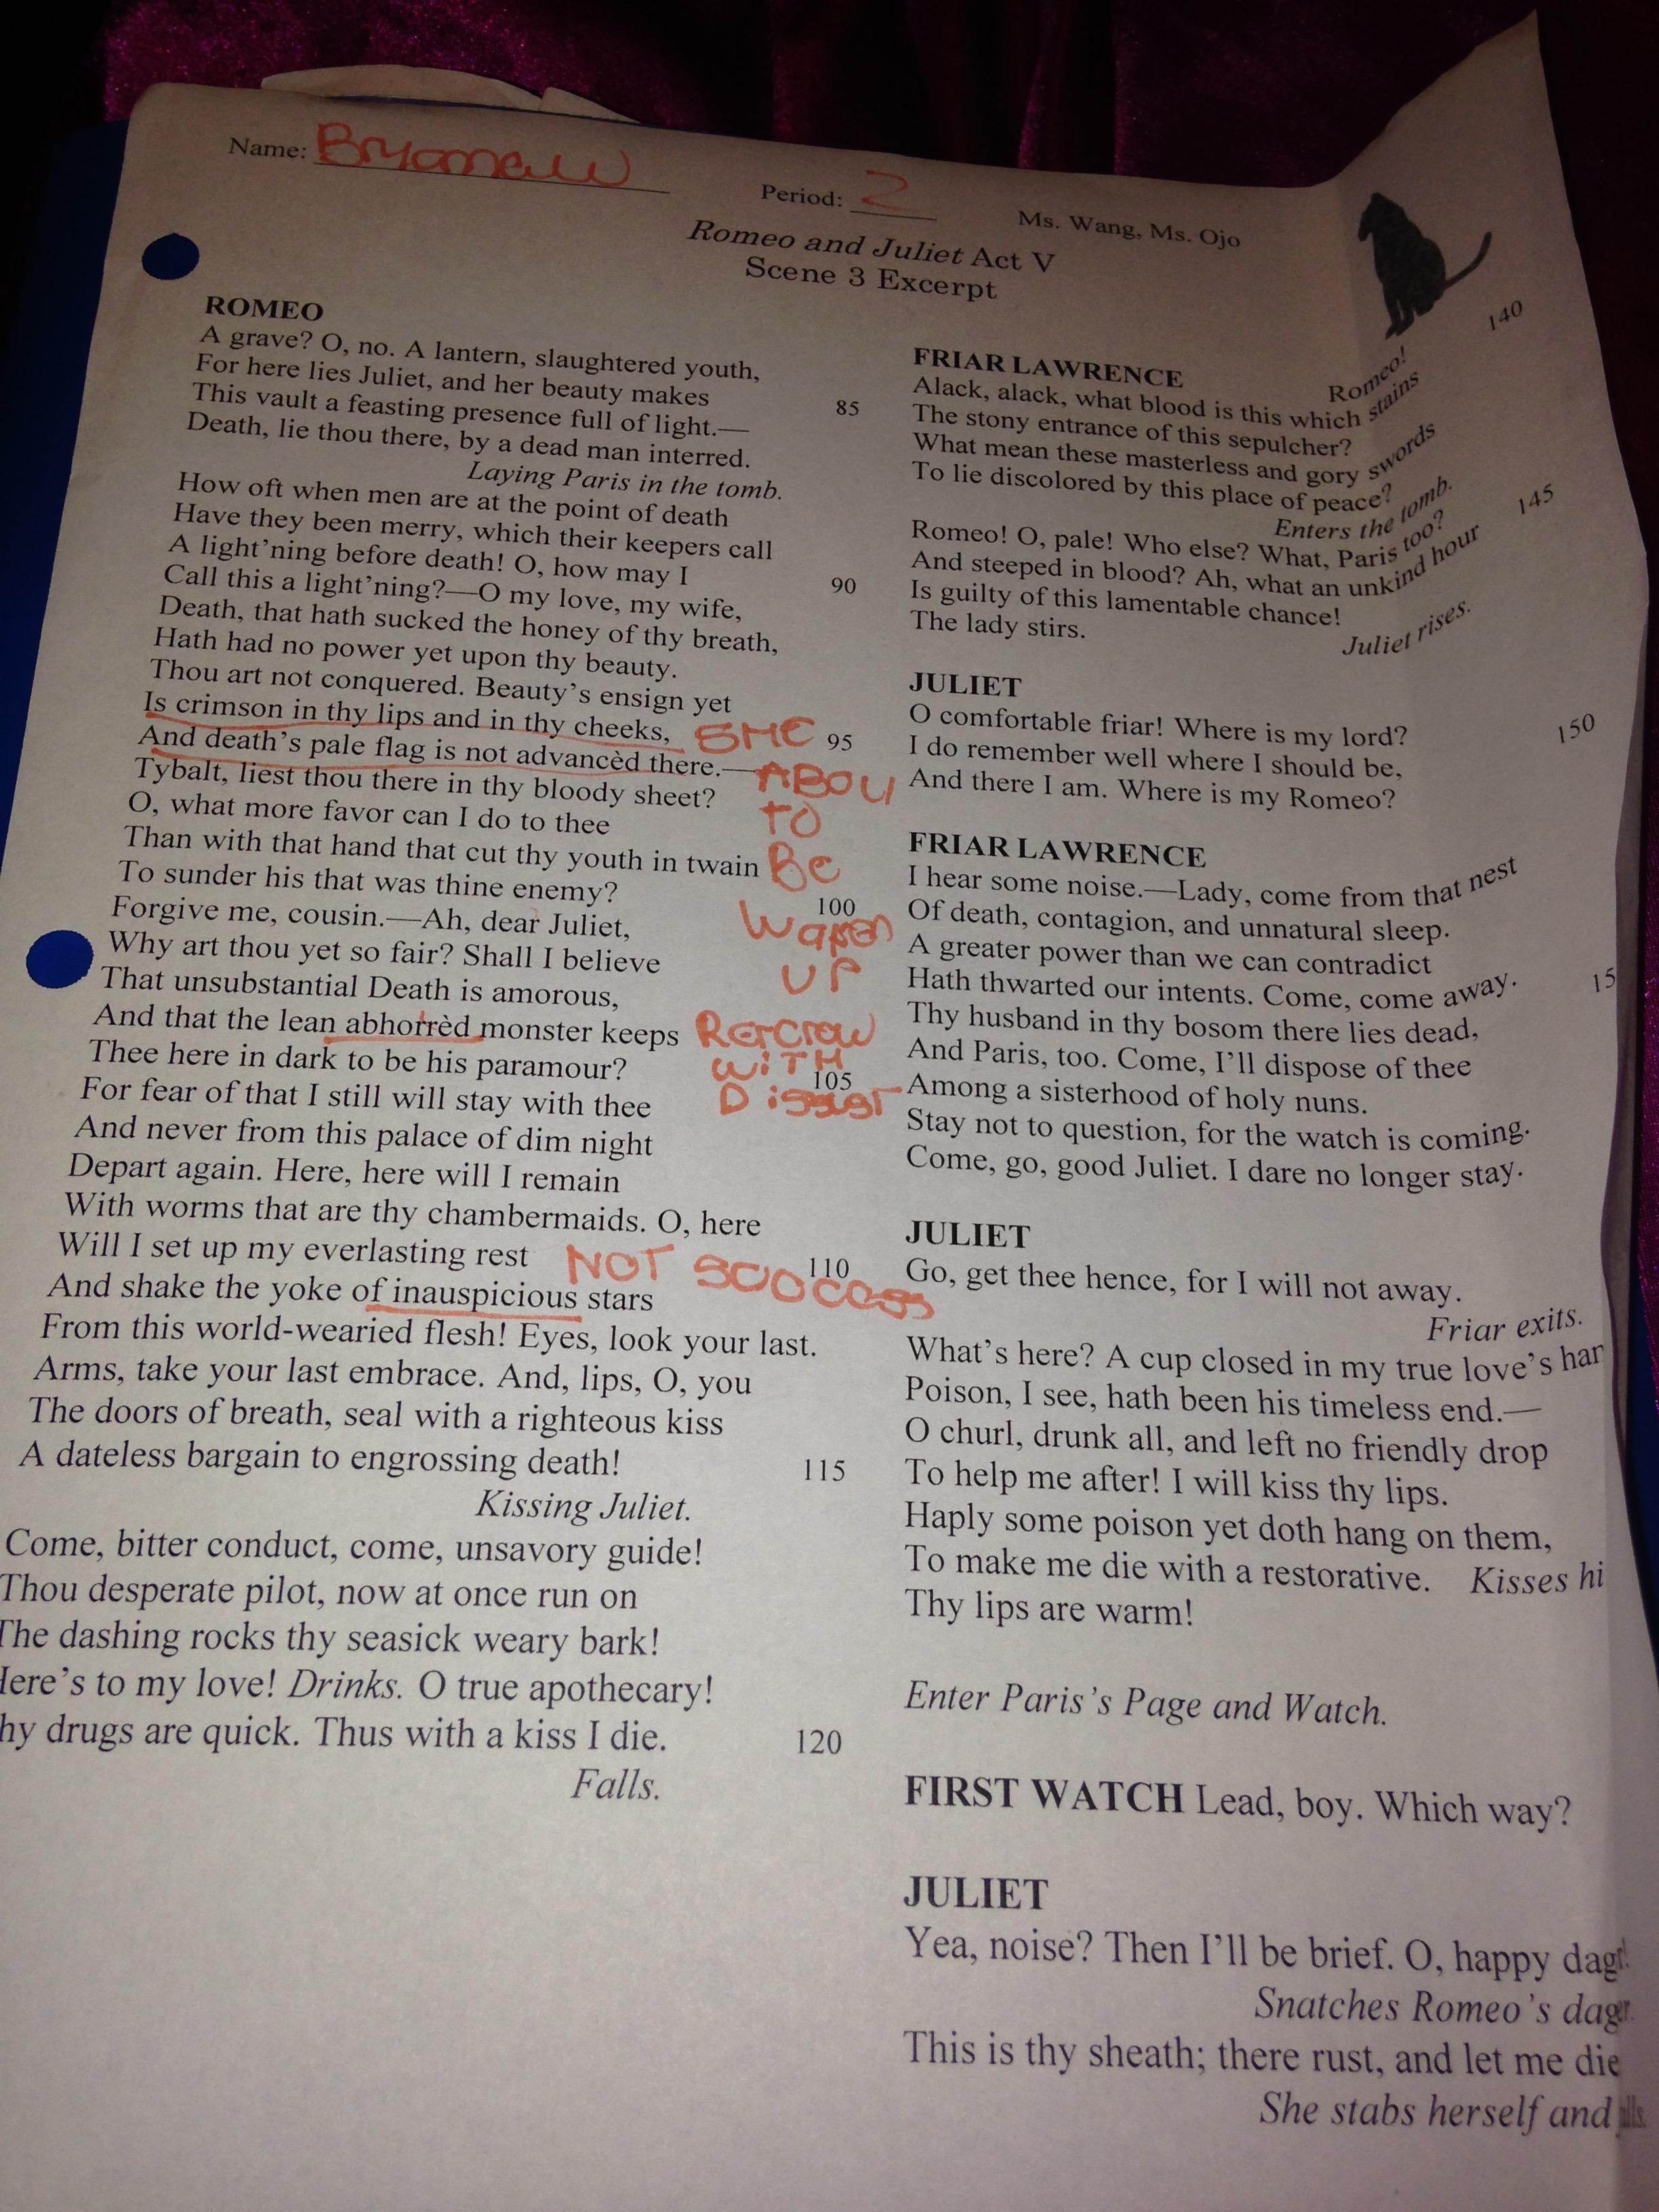 hamlet act 5 scene 2 pdf